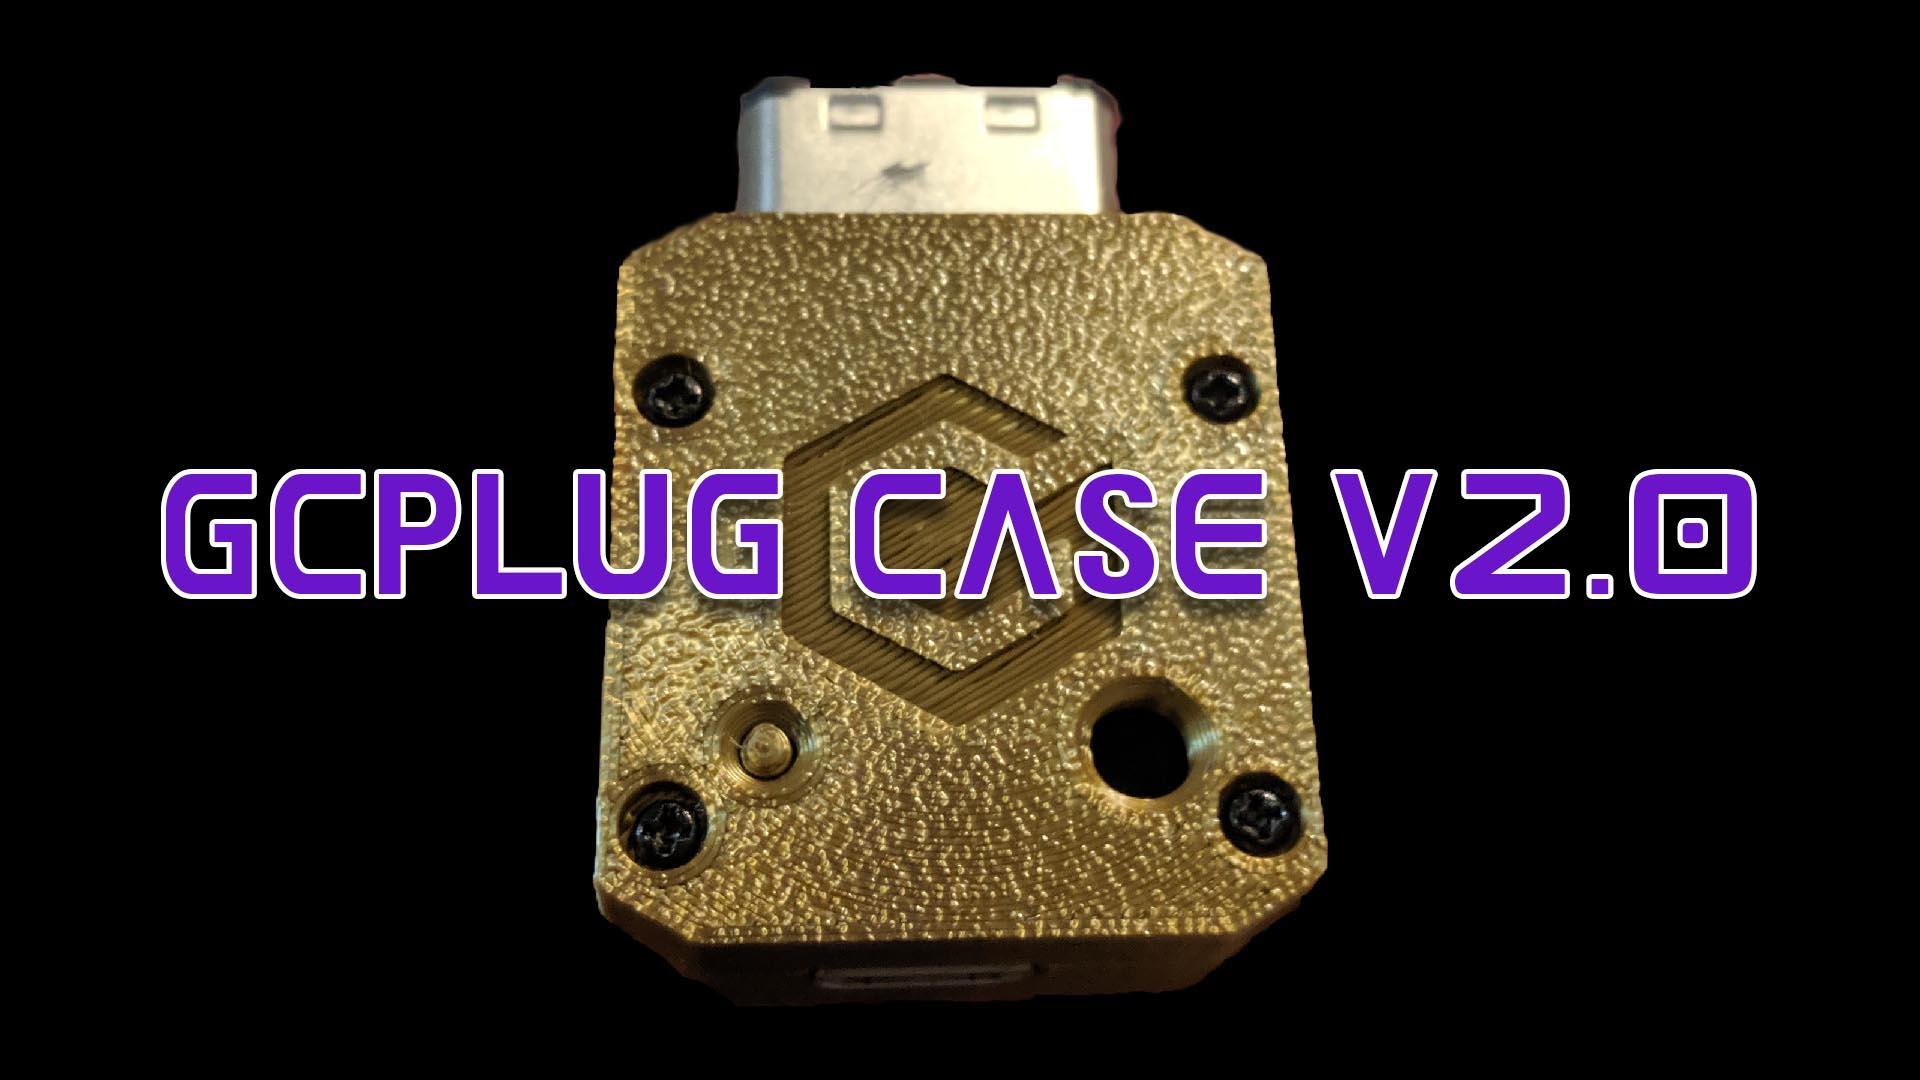 GCPlug2.0 Case